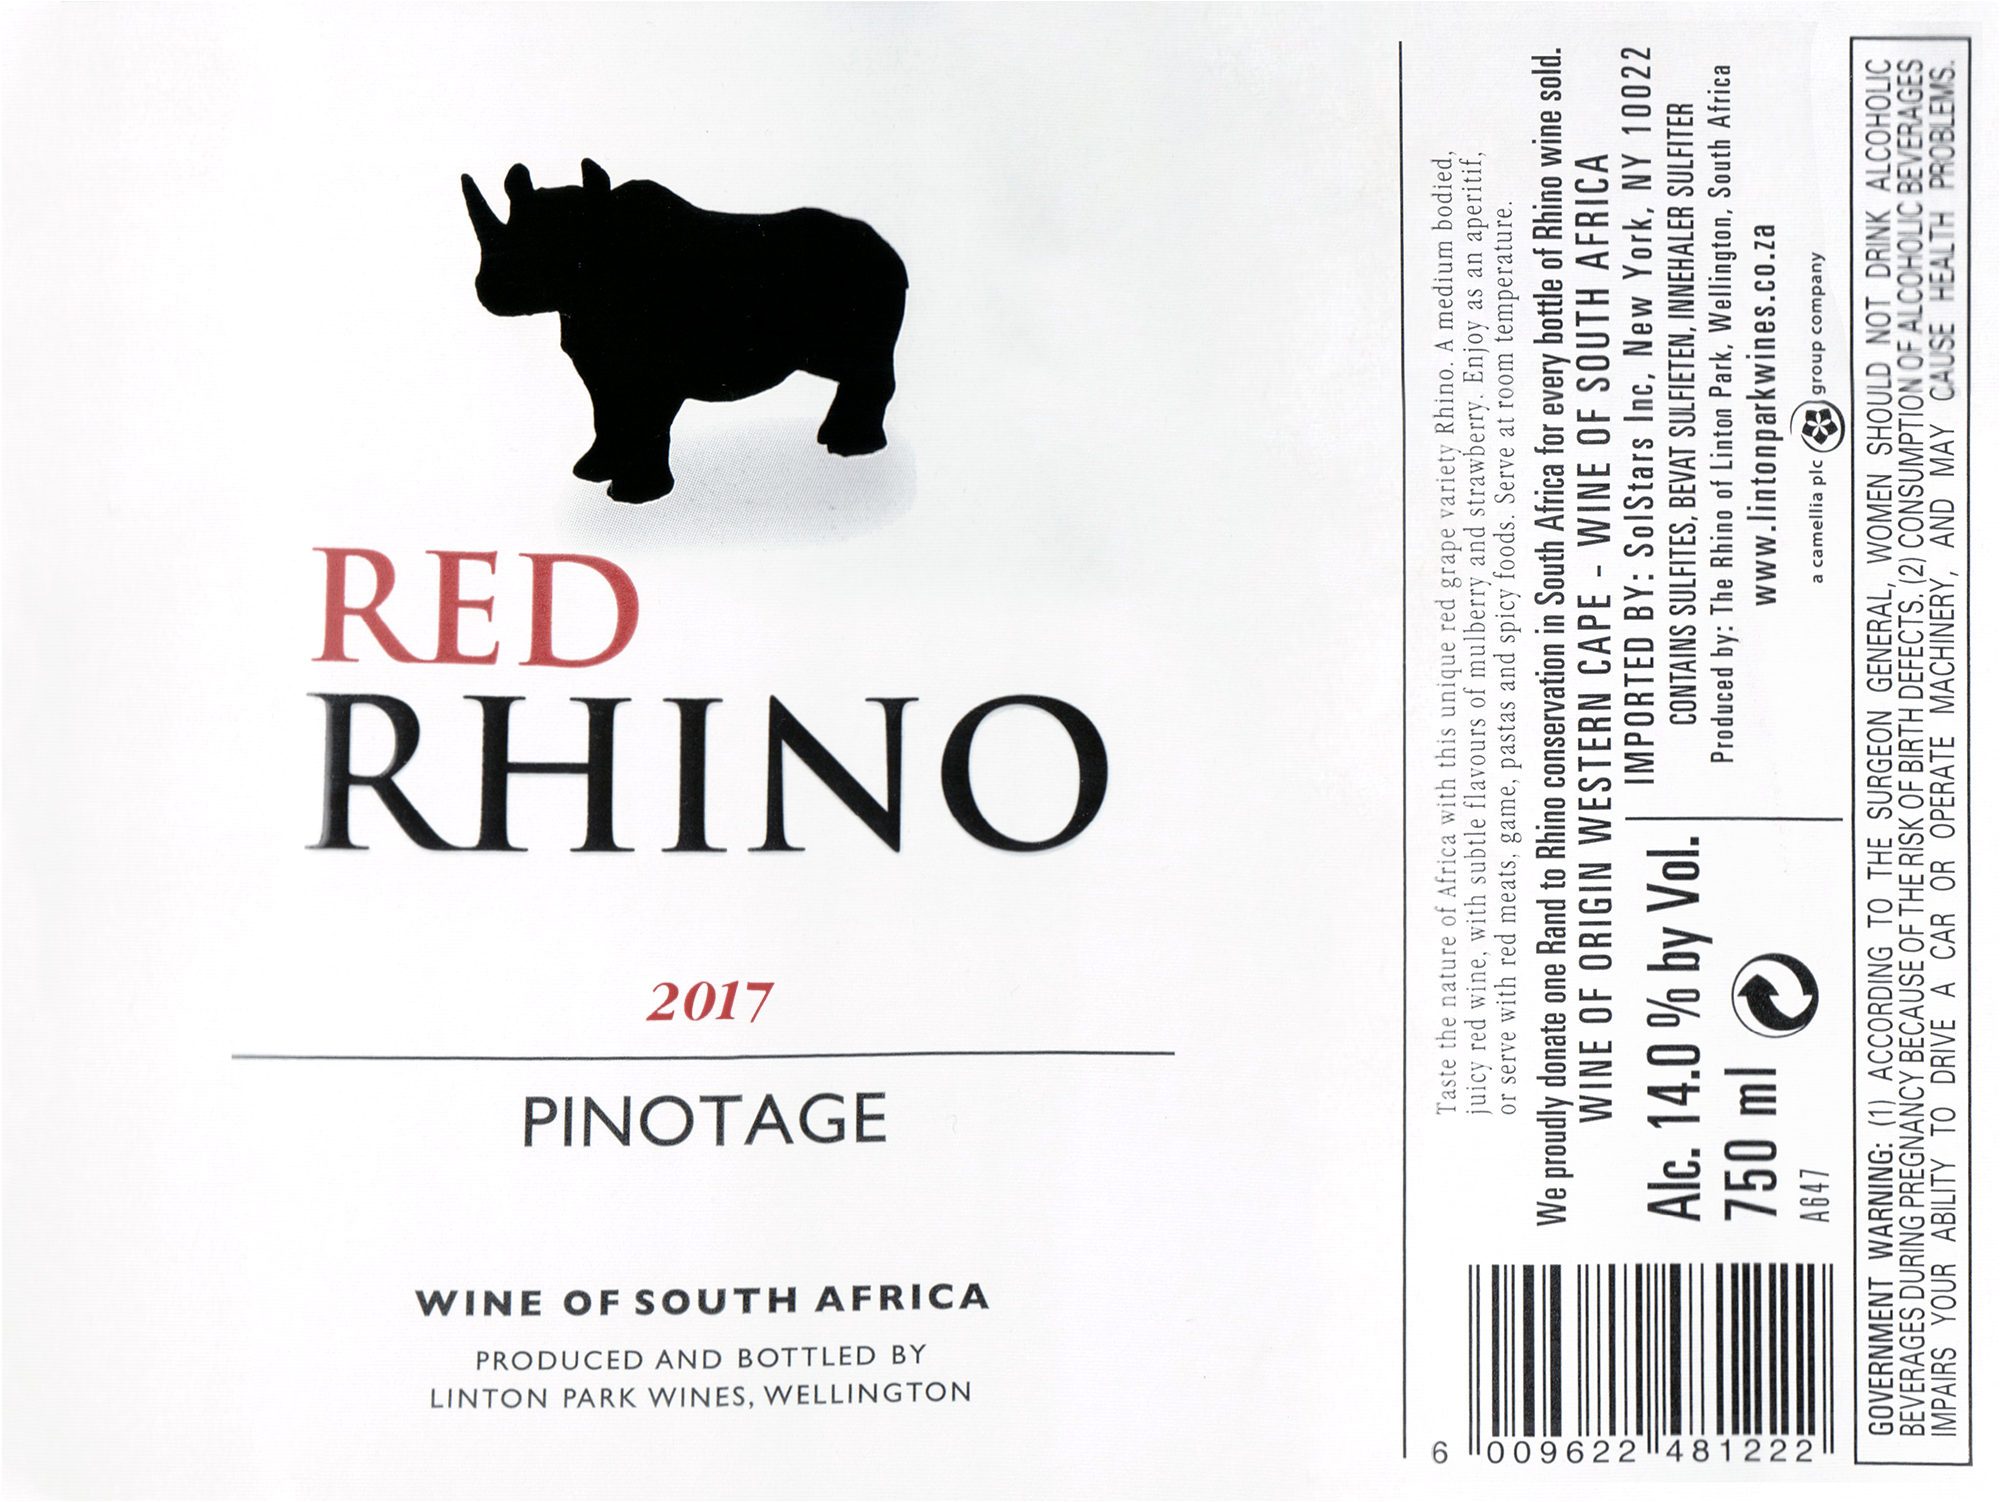 Red Rhino Pinotage 2017